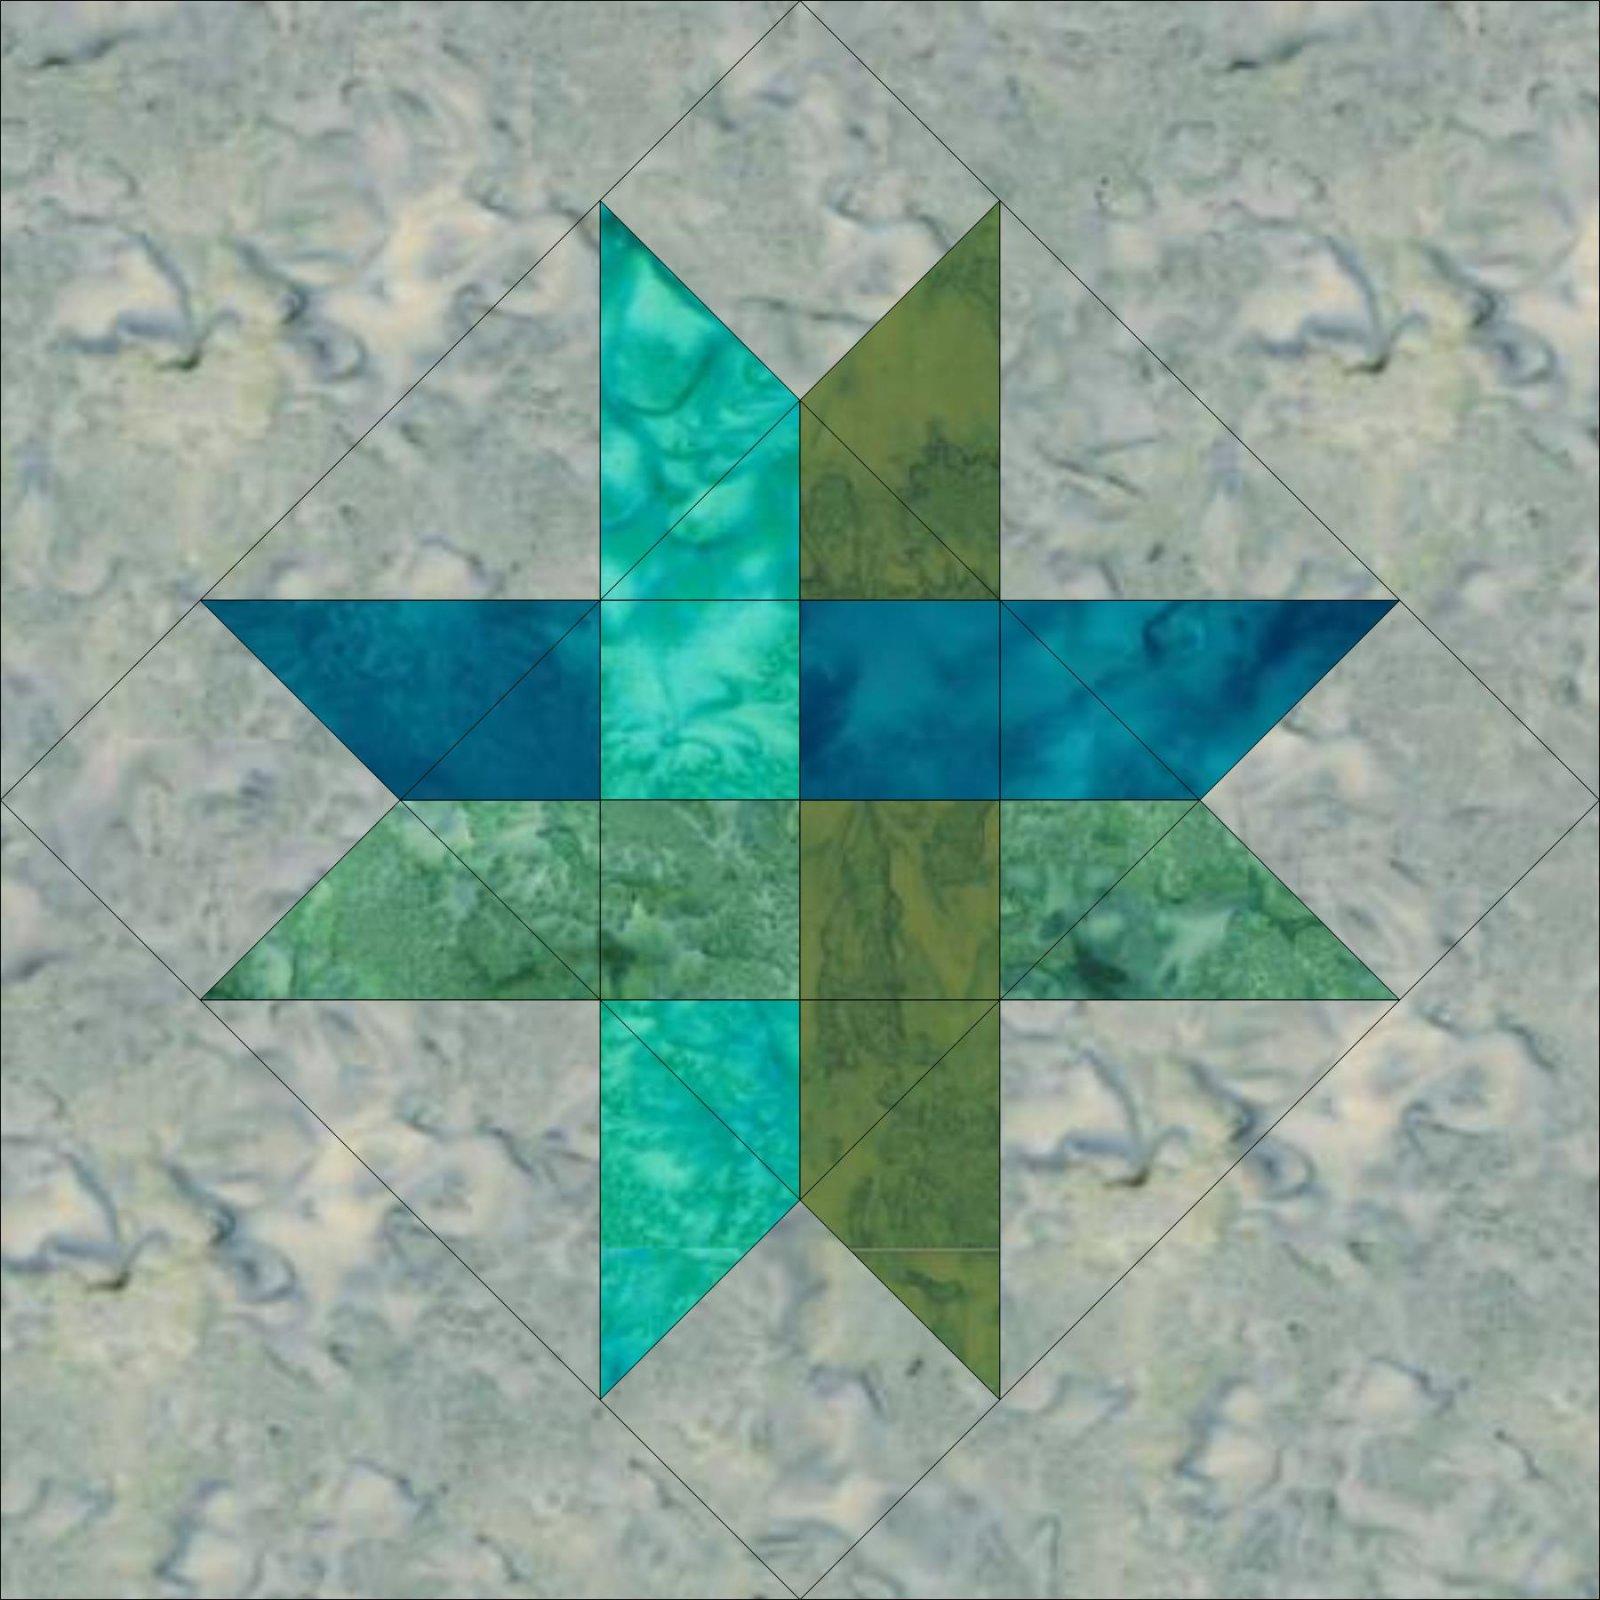 SS19-08-B Woven Star Pattern - Batik (Digital Download)